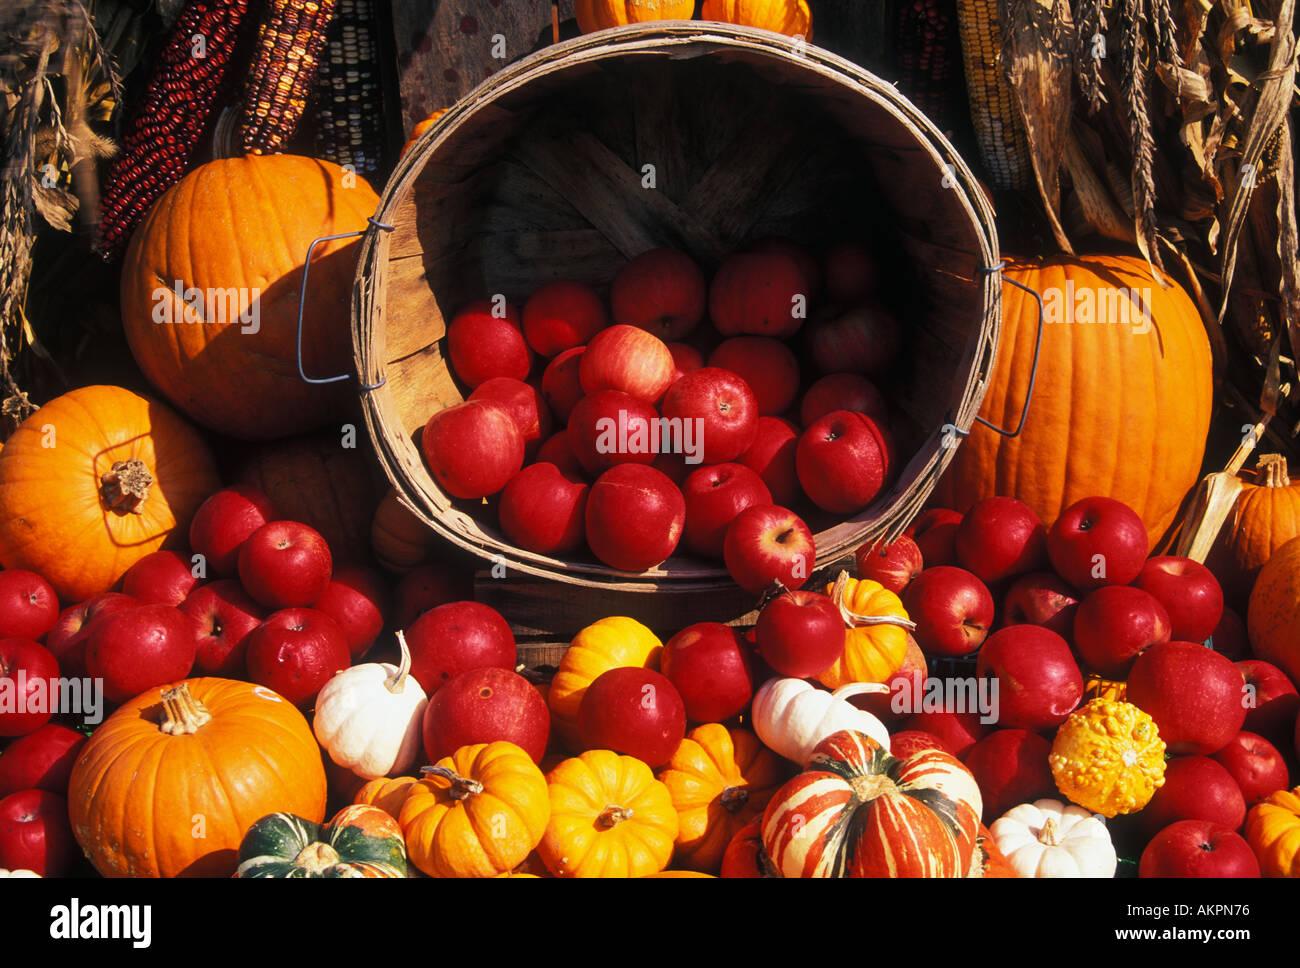 Autumn Harvest Apples Pumpkins Squash Indian Corn New Albany Indiana Basket Cornucopia - Stock Image